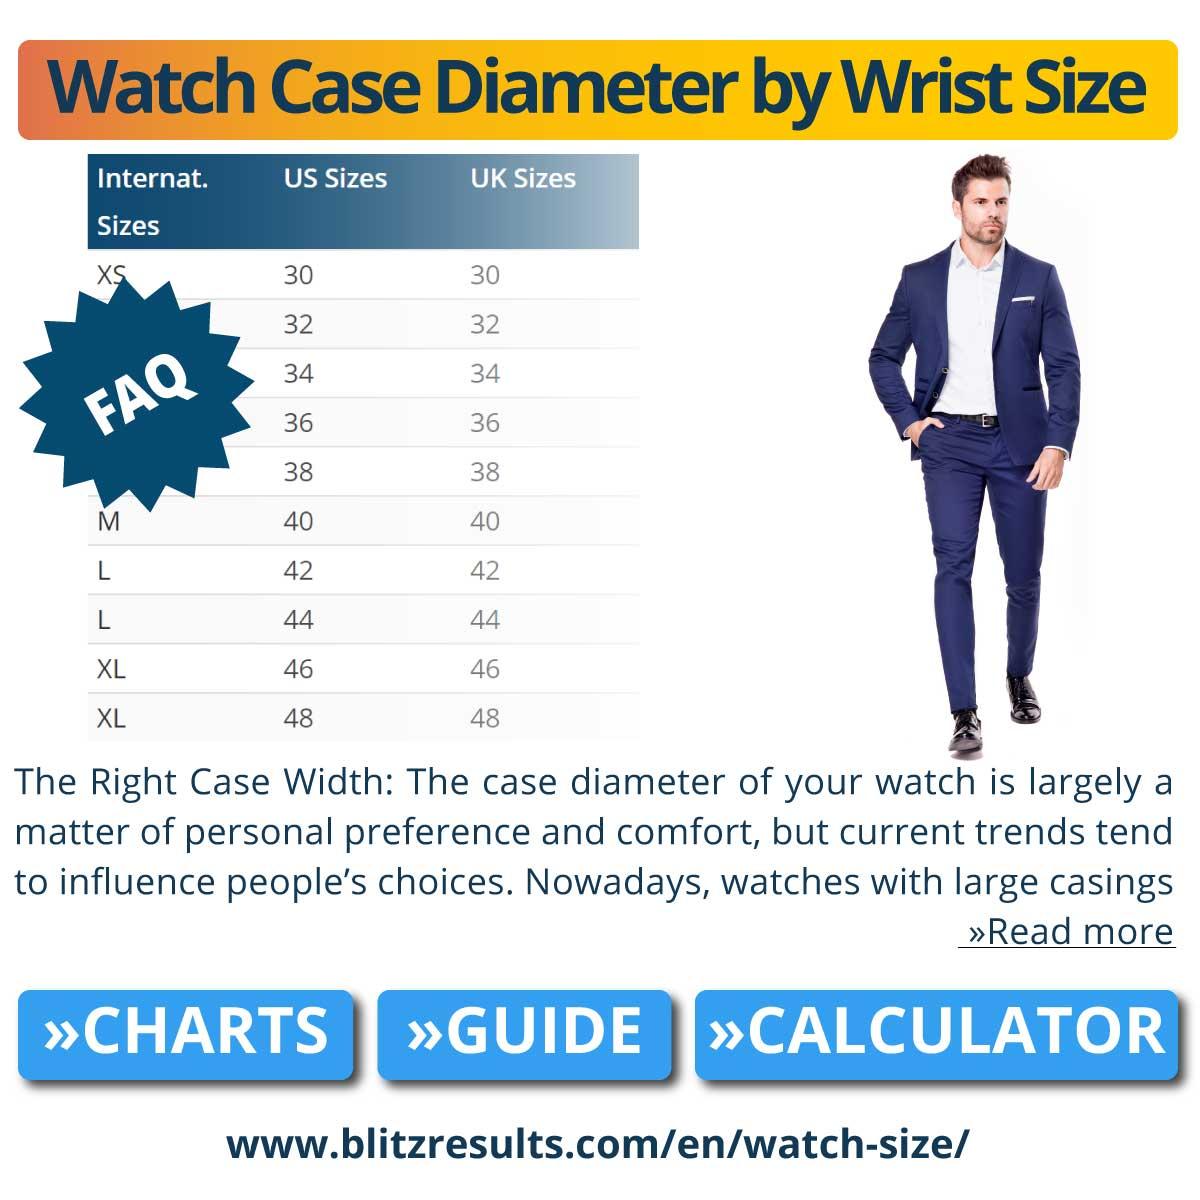 Watch Case Diameter by Wrist Size